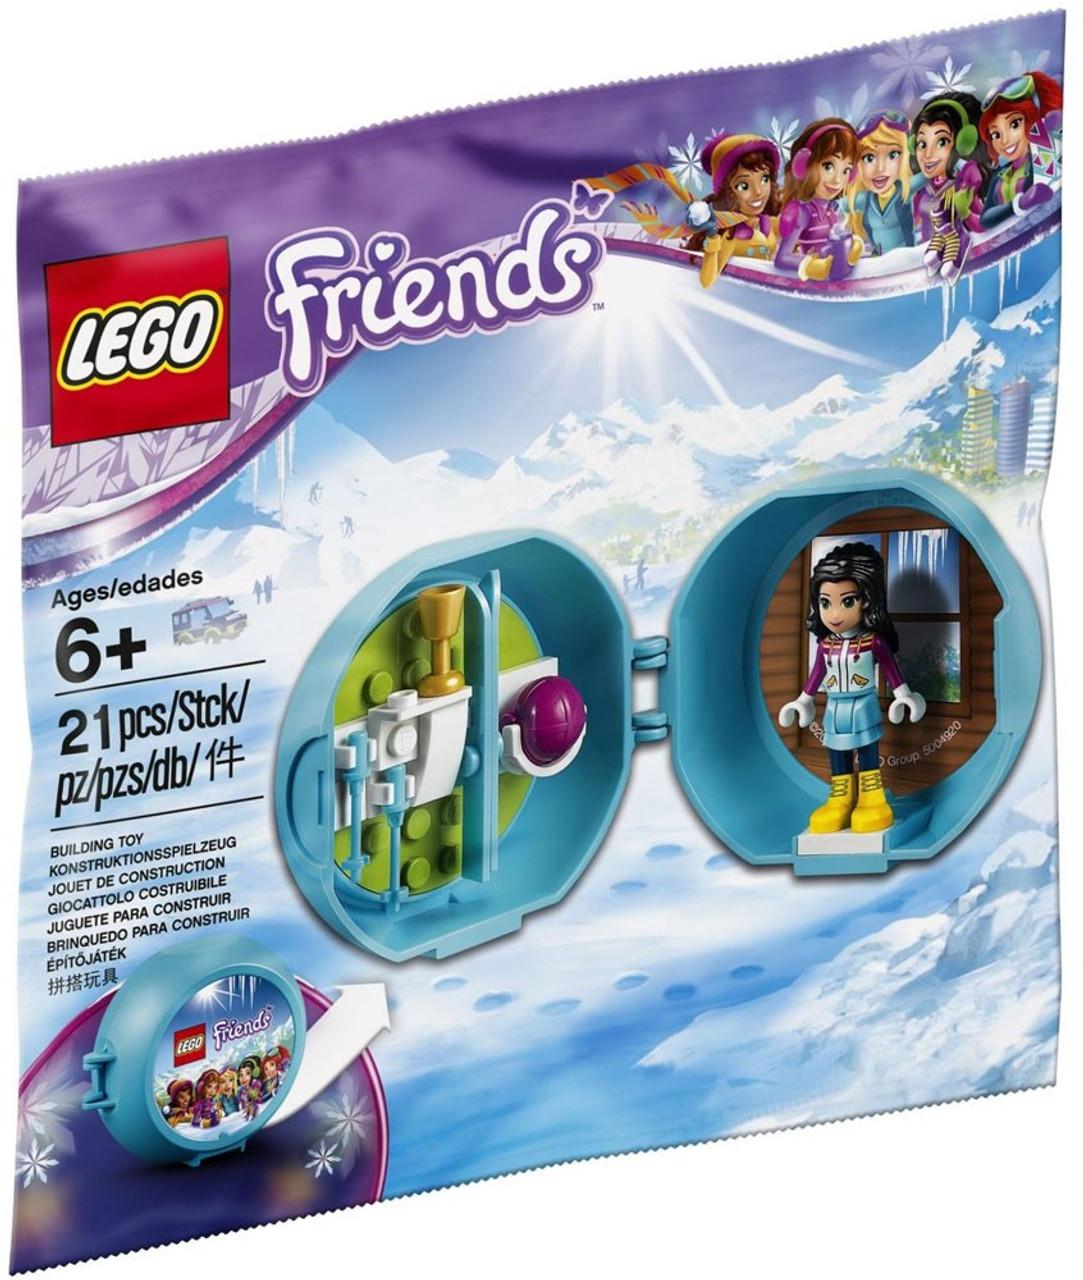 Lego Friends Emmas Ski Pod Mini Set 5004920 Bagged Toywiz